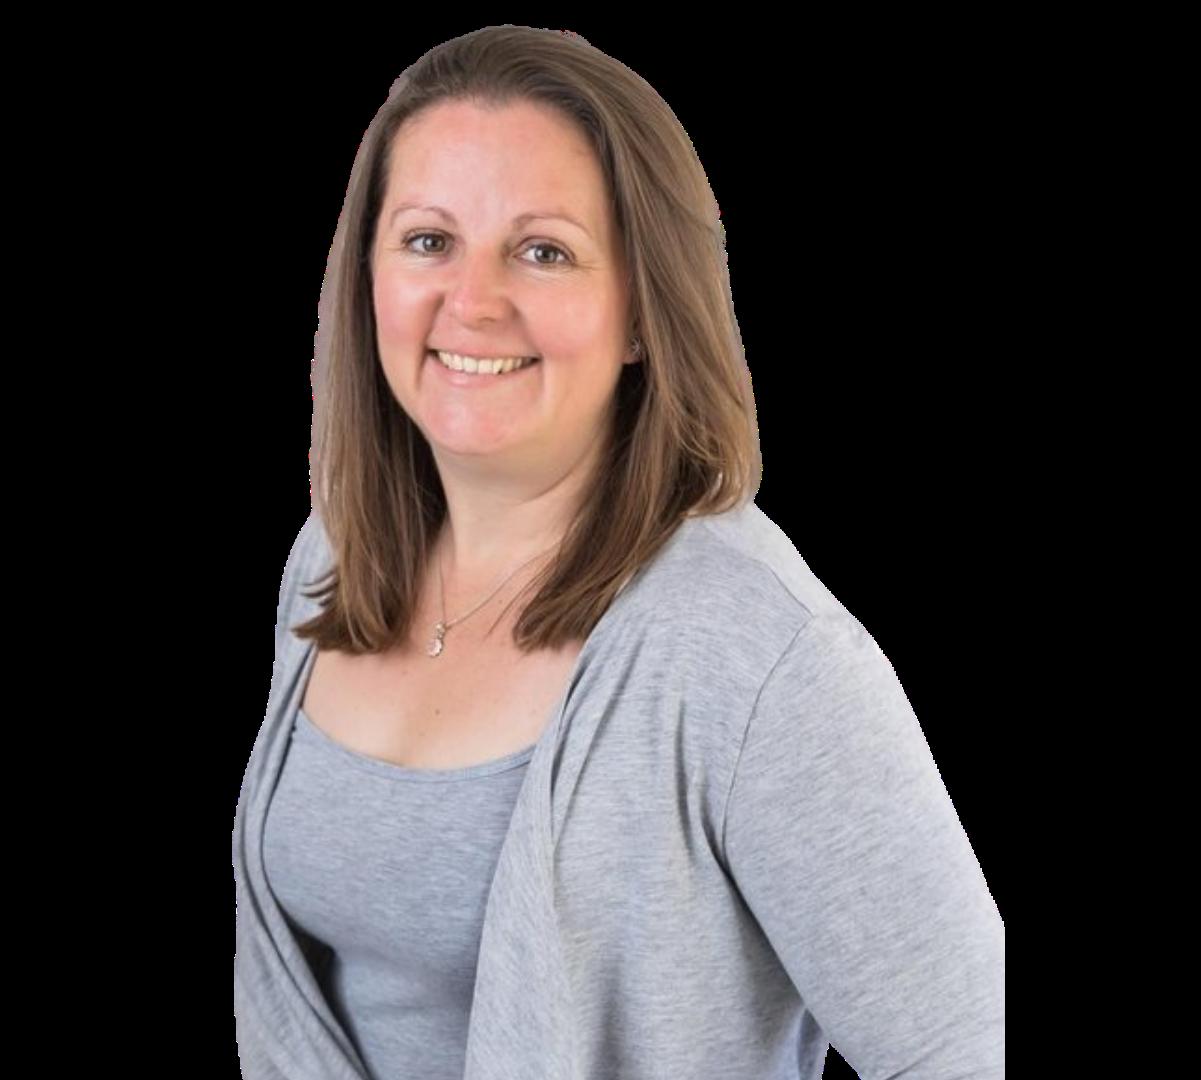 Sarah-Jane Lewis Holistic Energy Practitioner Helping Women Heal